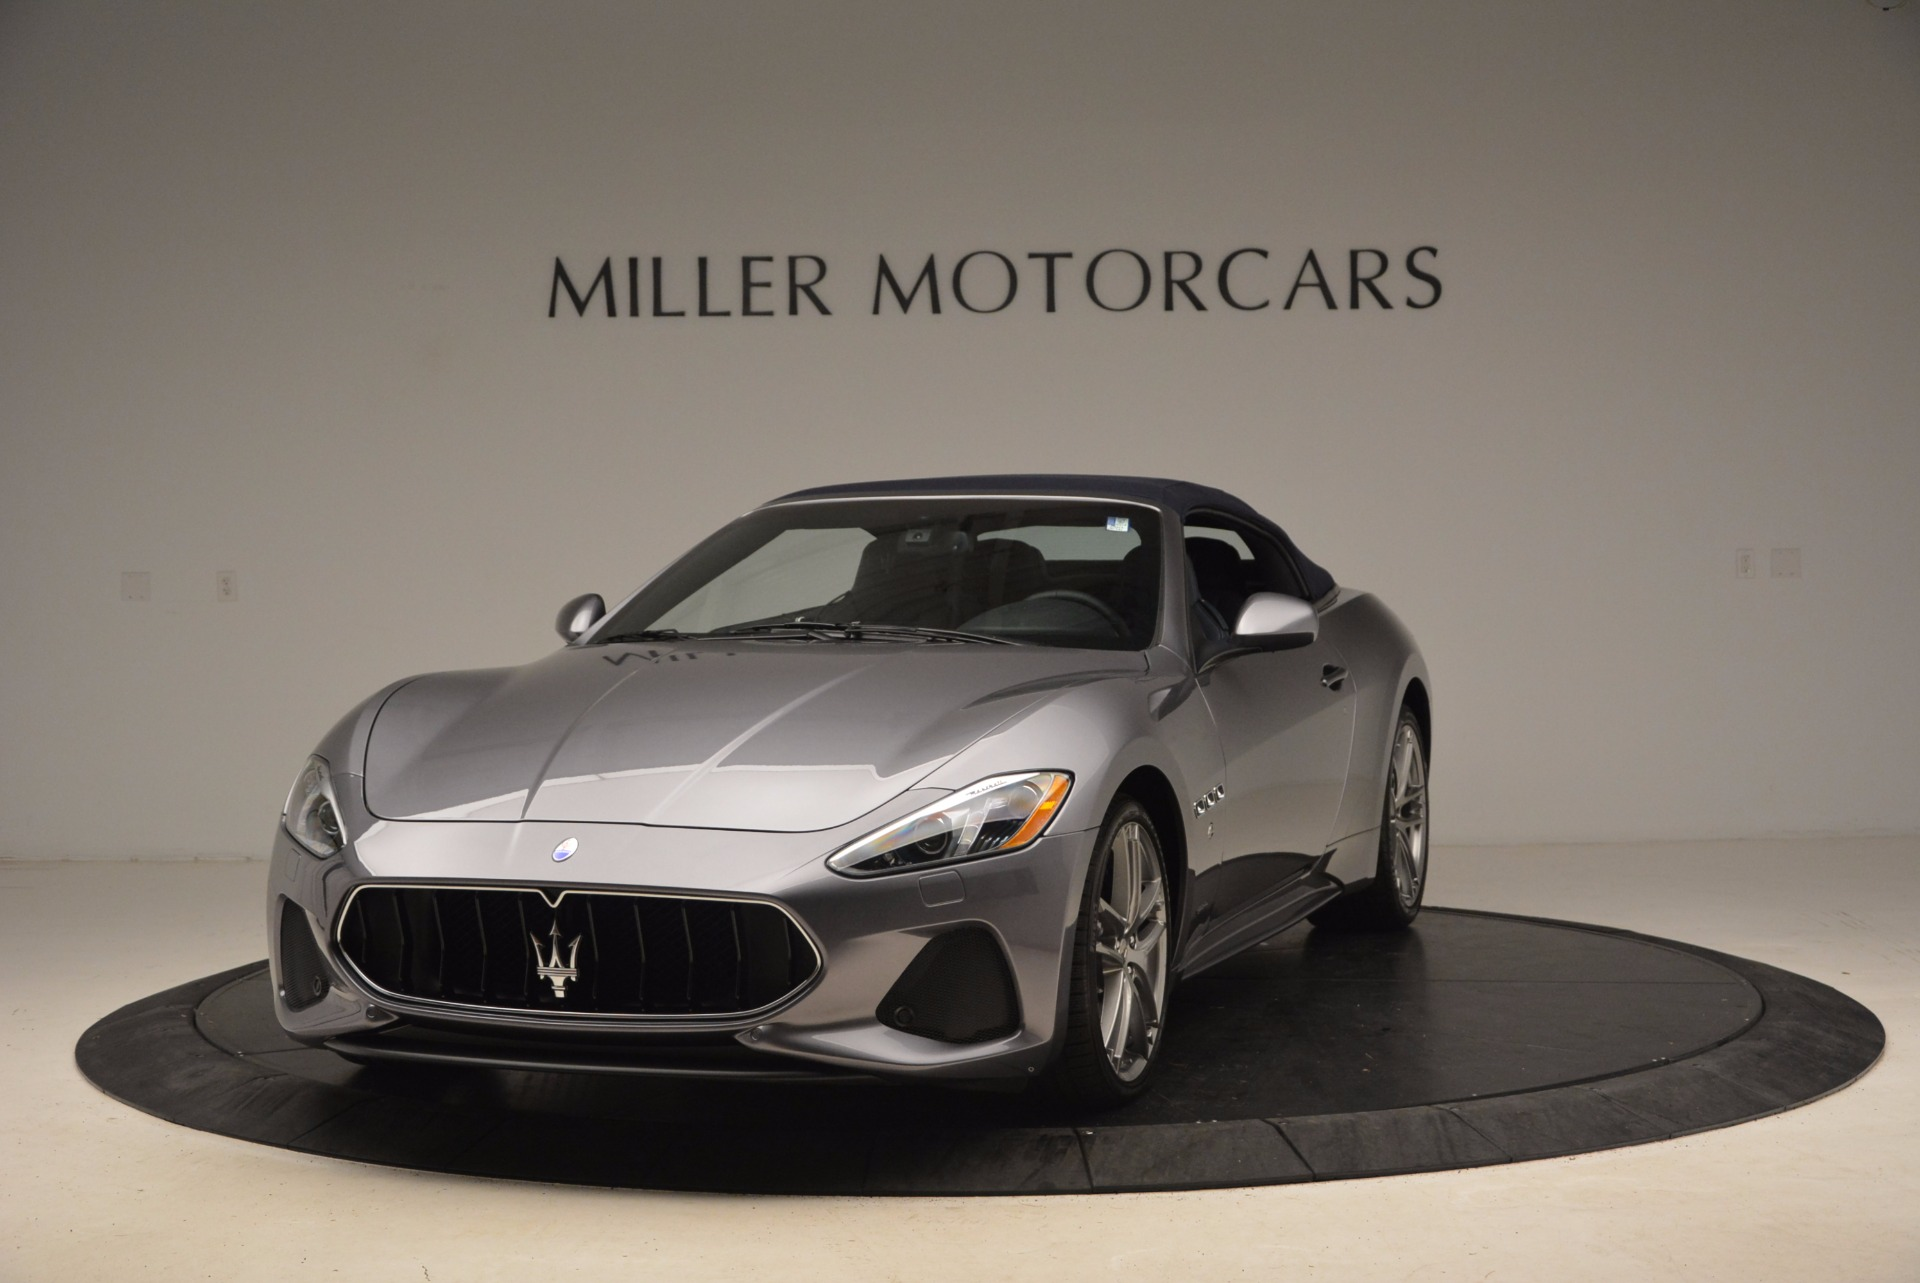 New 2018 Maserati GranTurismo Sport Convertible For Sale In Westport, CT 1703_p2